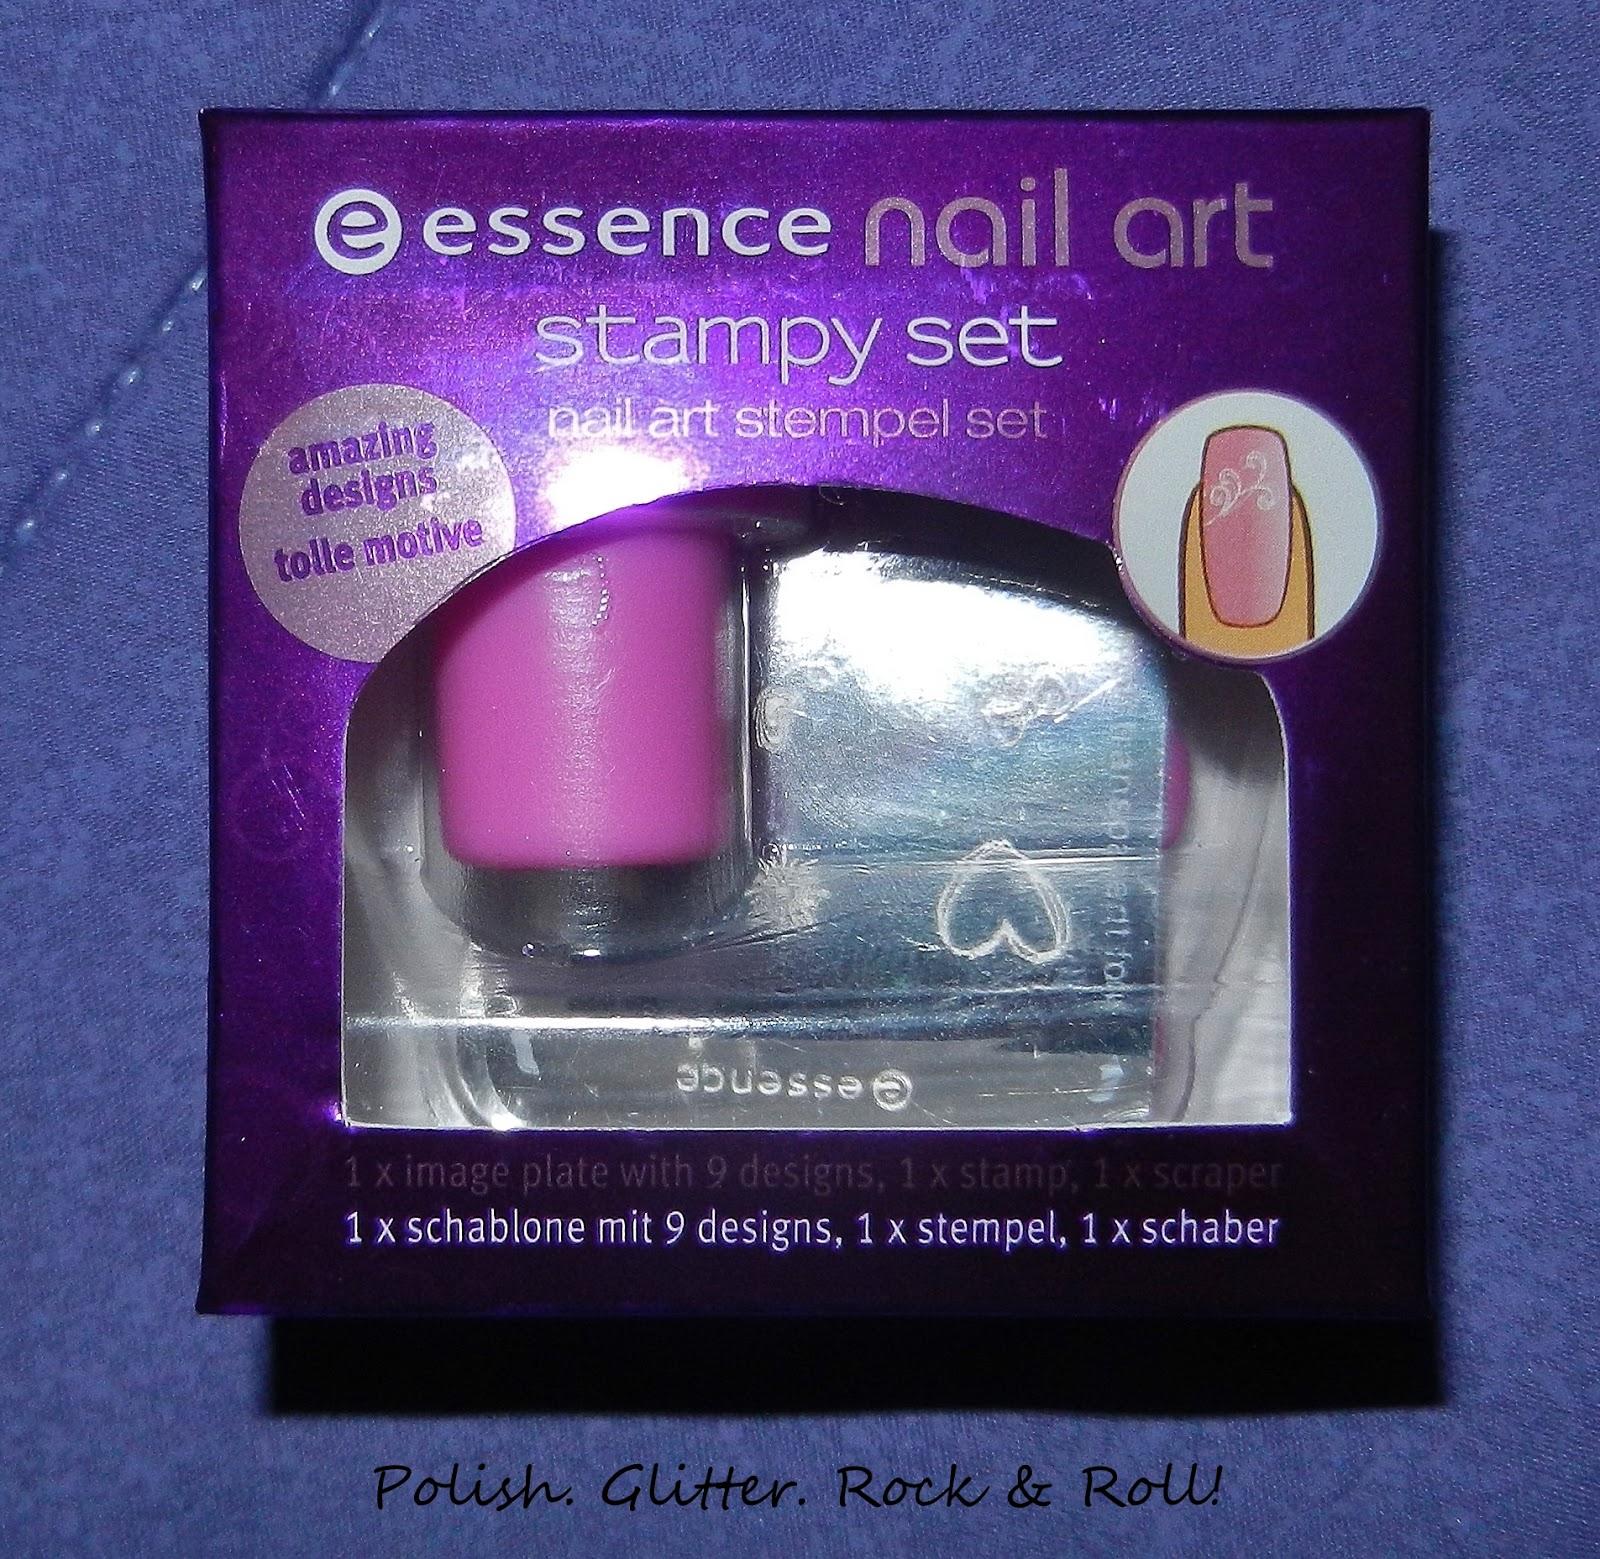 Polish Glitter Rock Roll Product Review Essence Nail Art